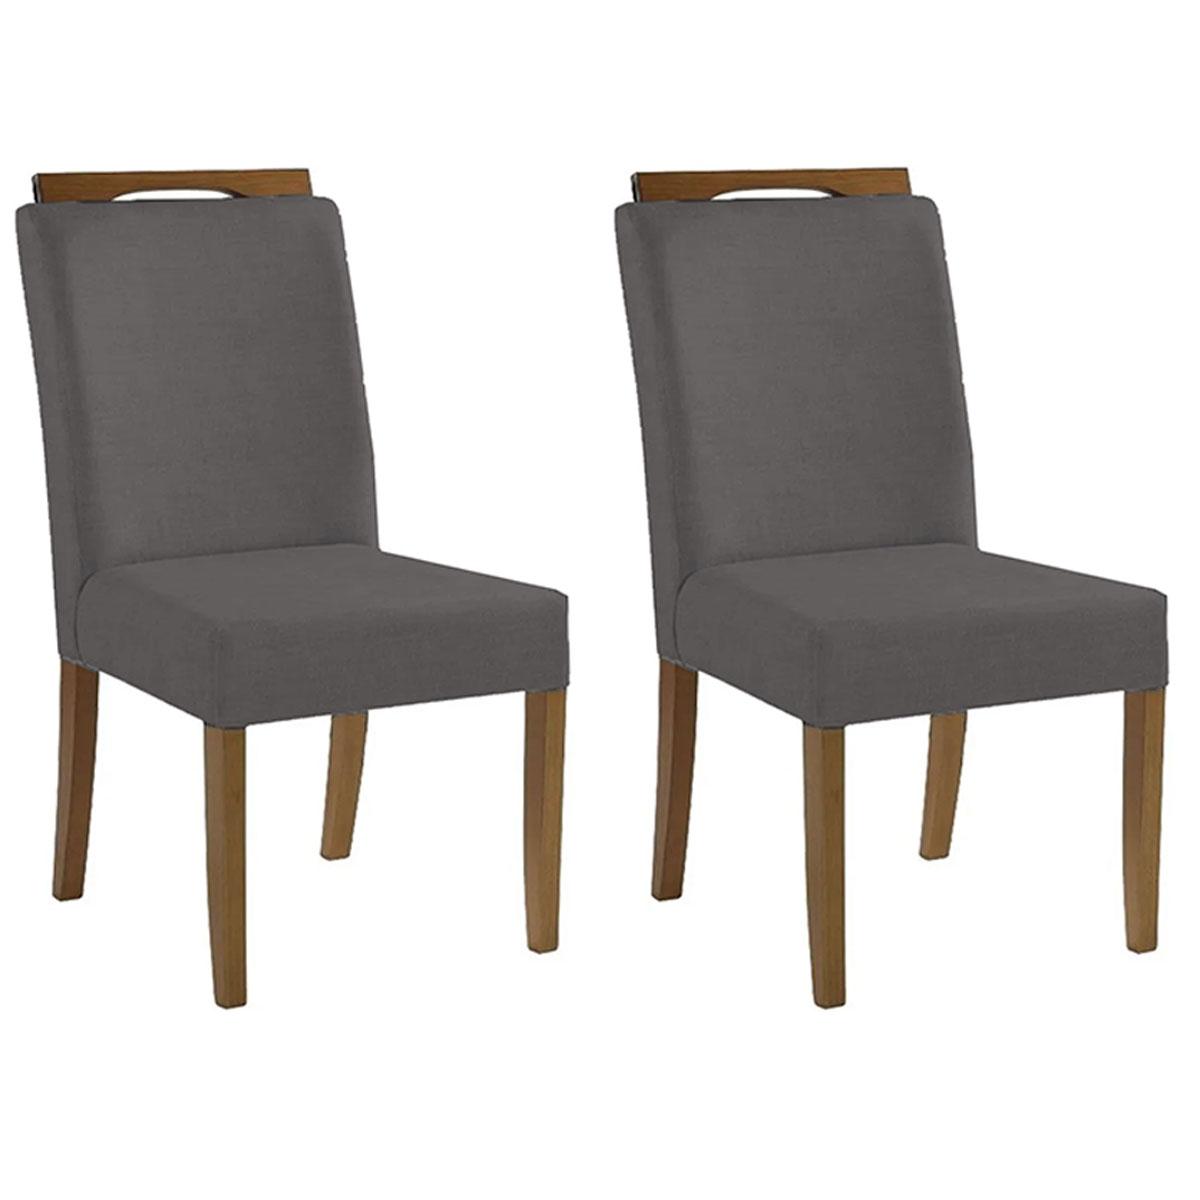 Kit 2 Cadeiras Estofadas Heloísa 100% Madeira Suede Cinza